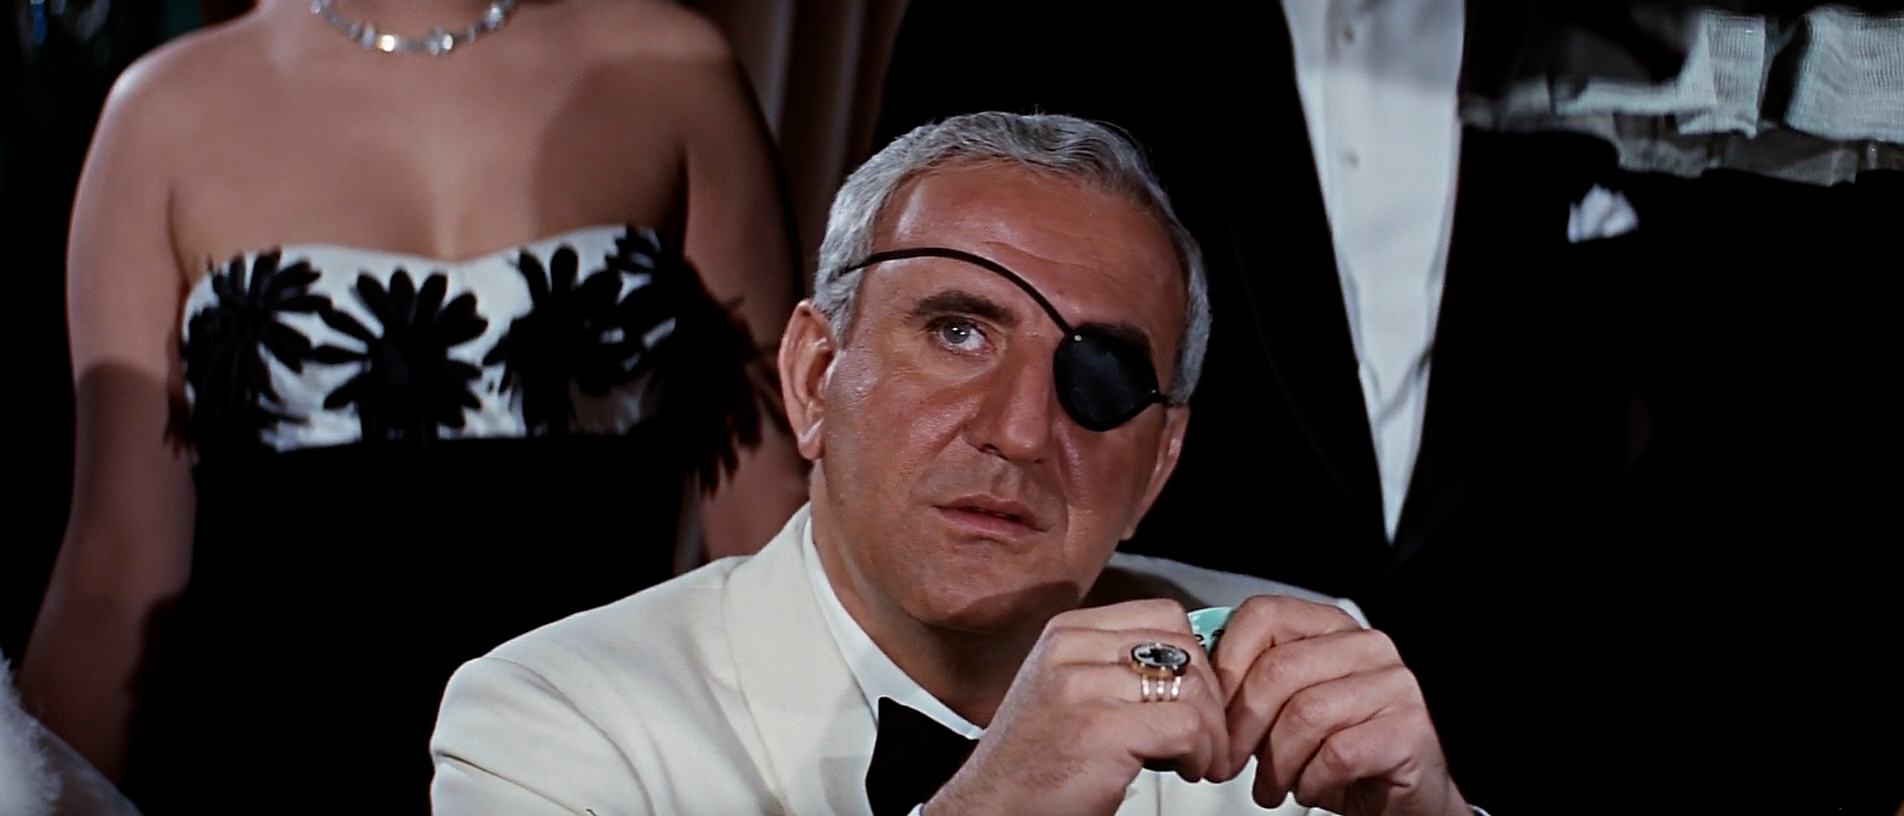 James Bond Spectre Ring